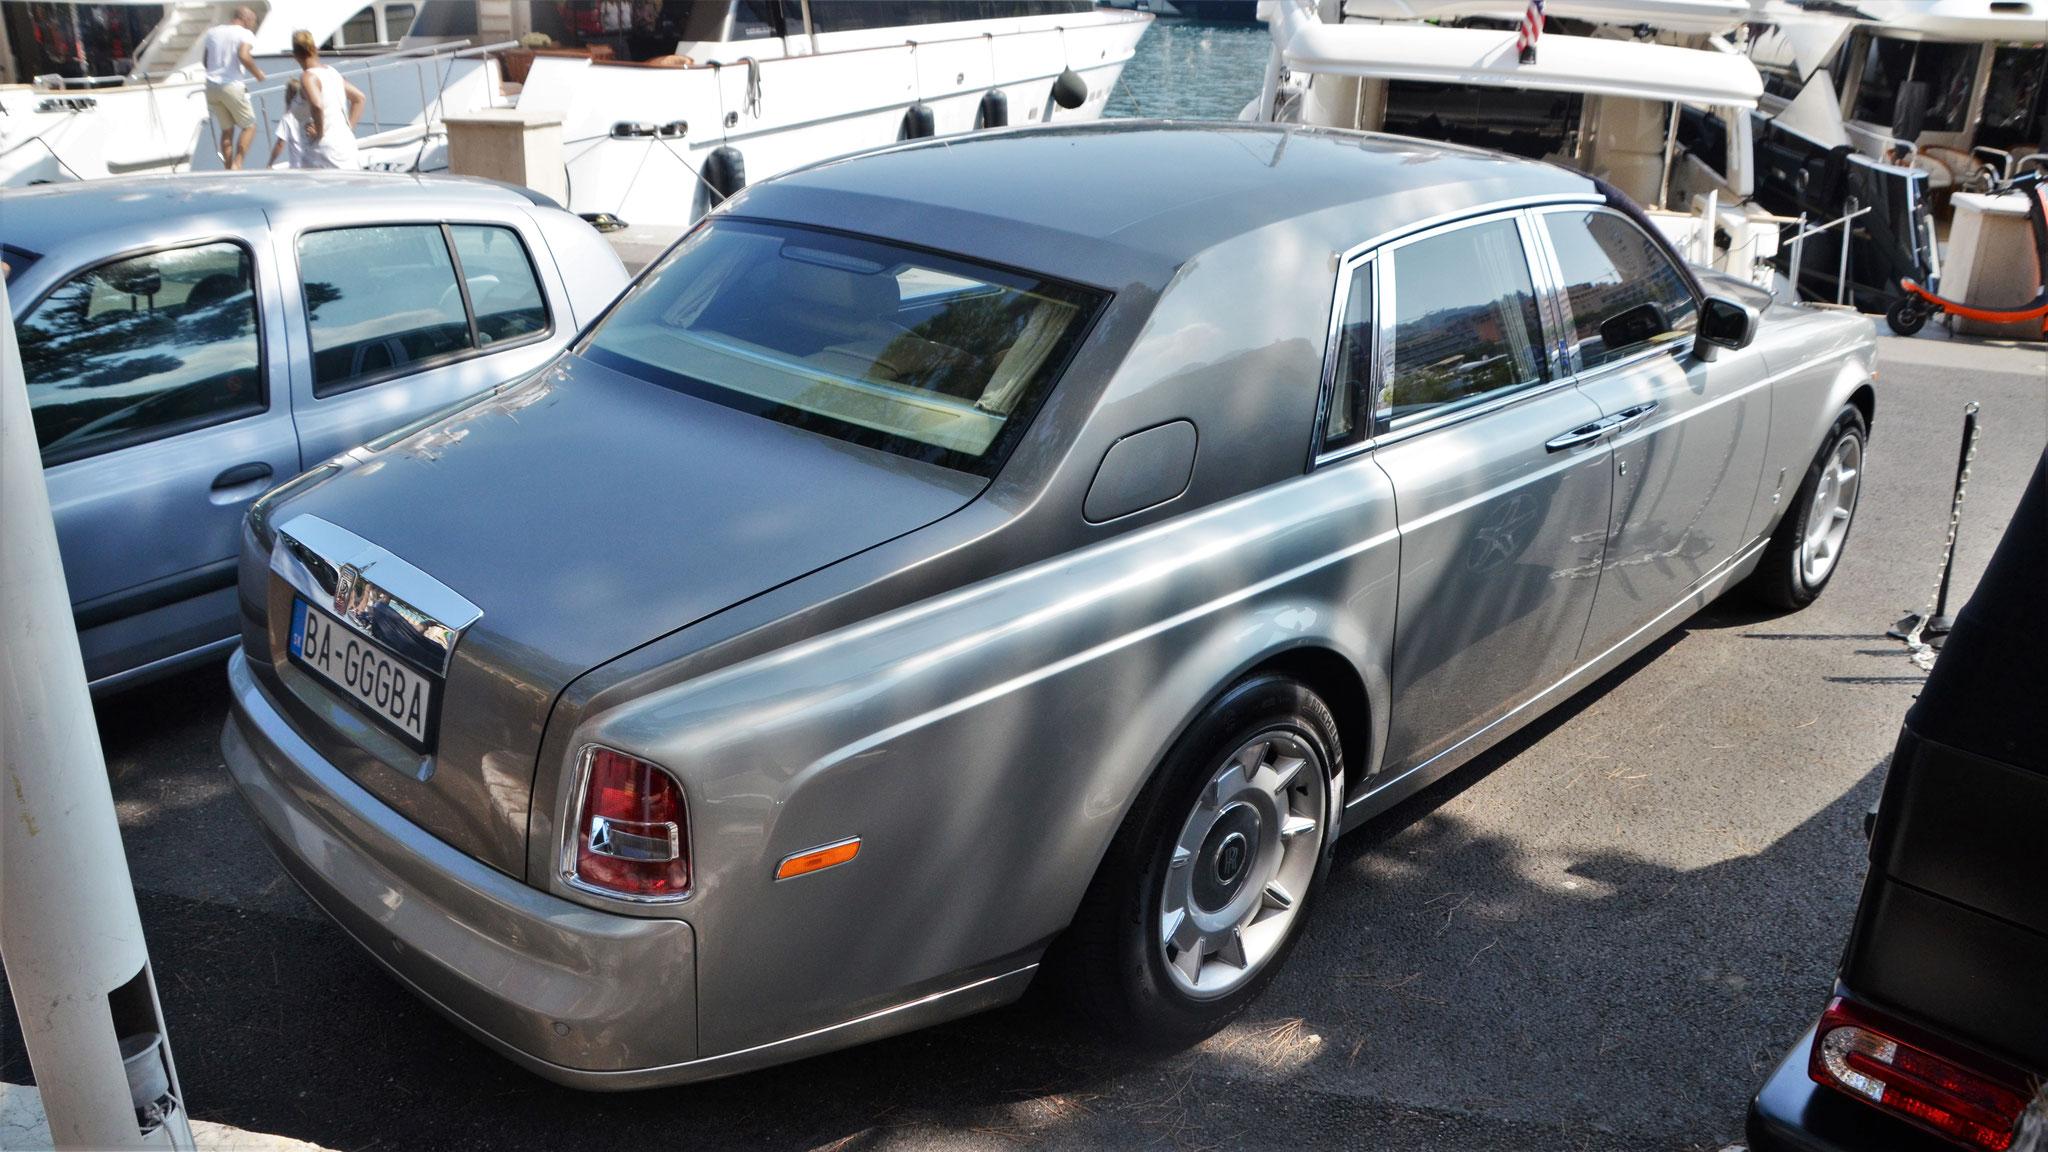 Rolls Royce Phantom - BA-GGGBA (SK)